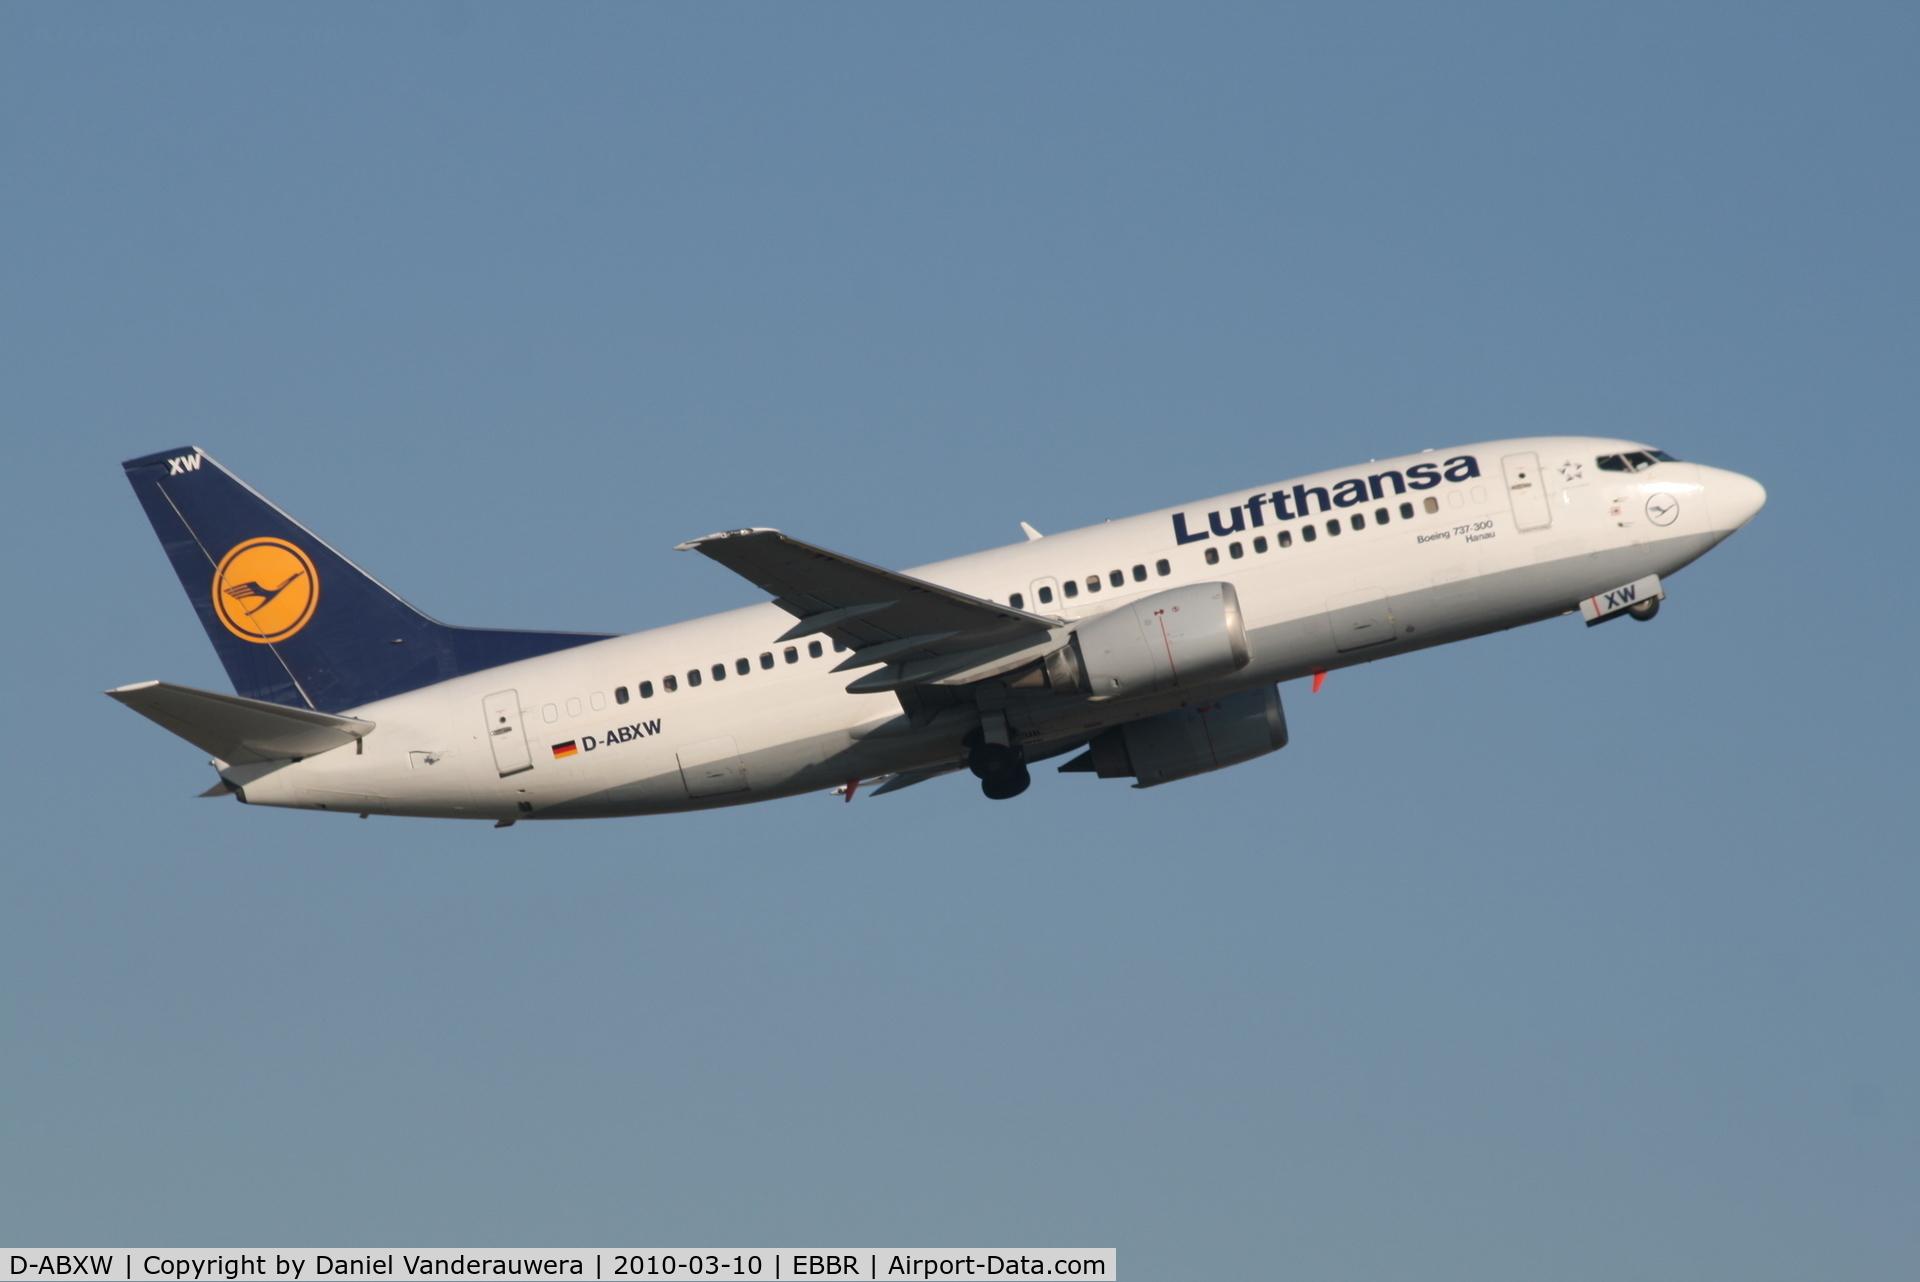 D-ABXW, 1989 Boeing 737-330 C/N 24561, Flight LH4571 is climbing from RWY 07R